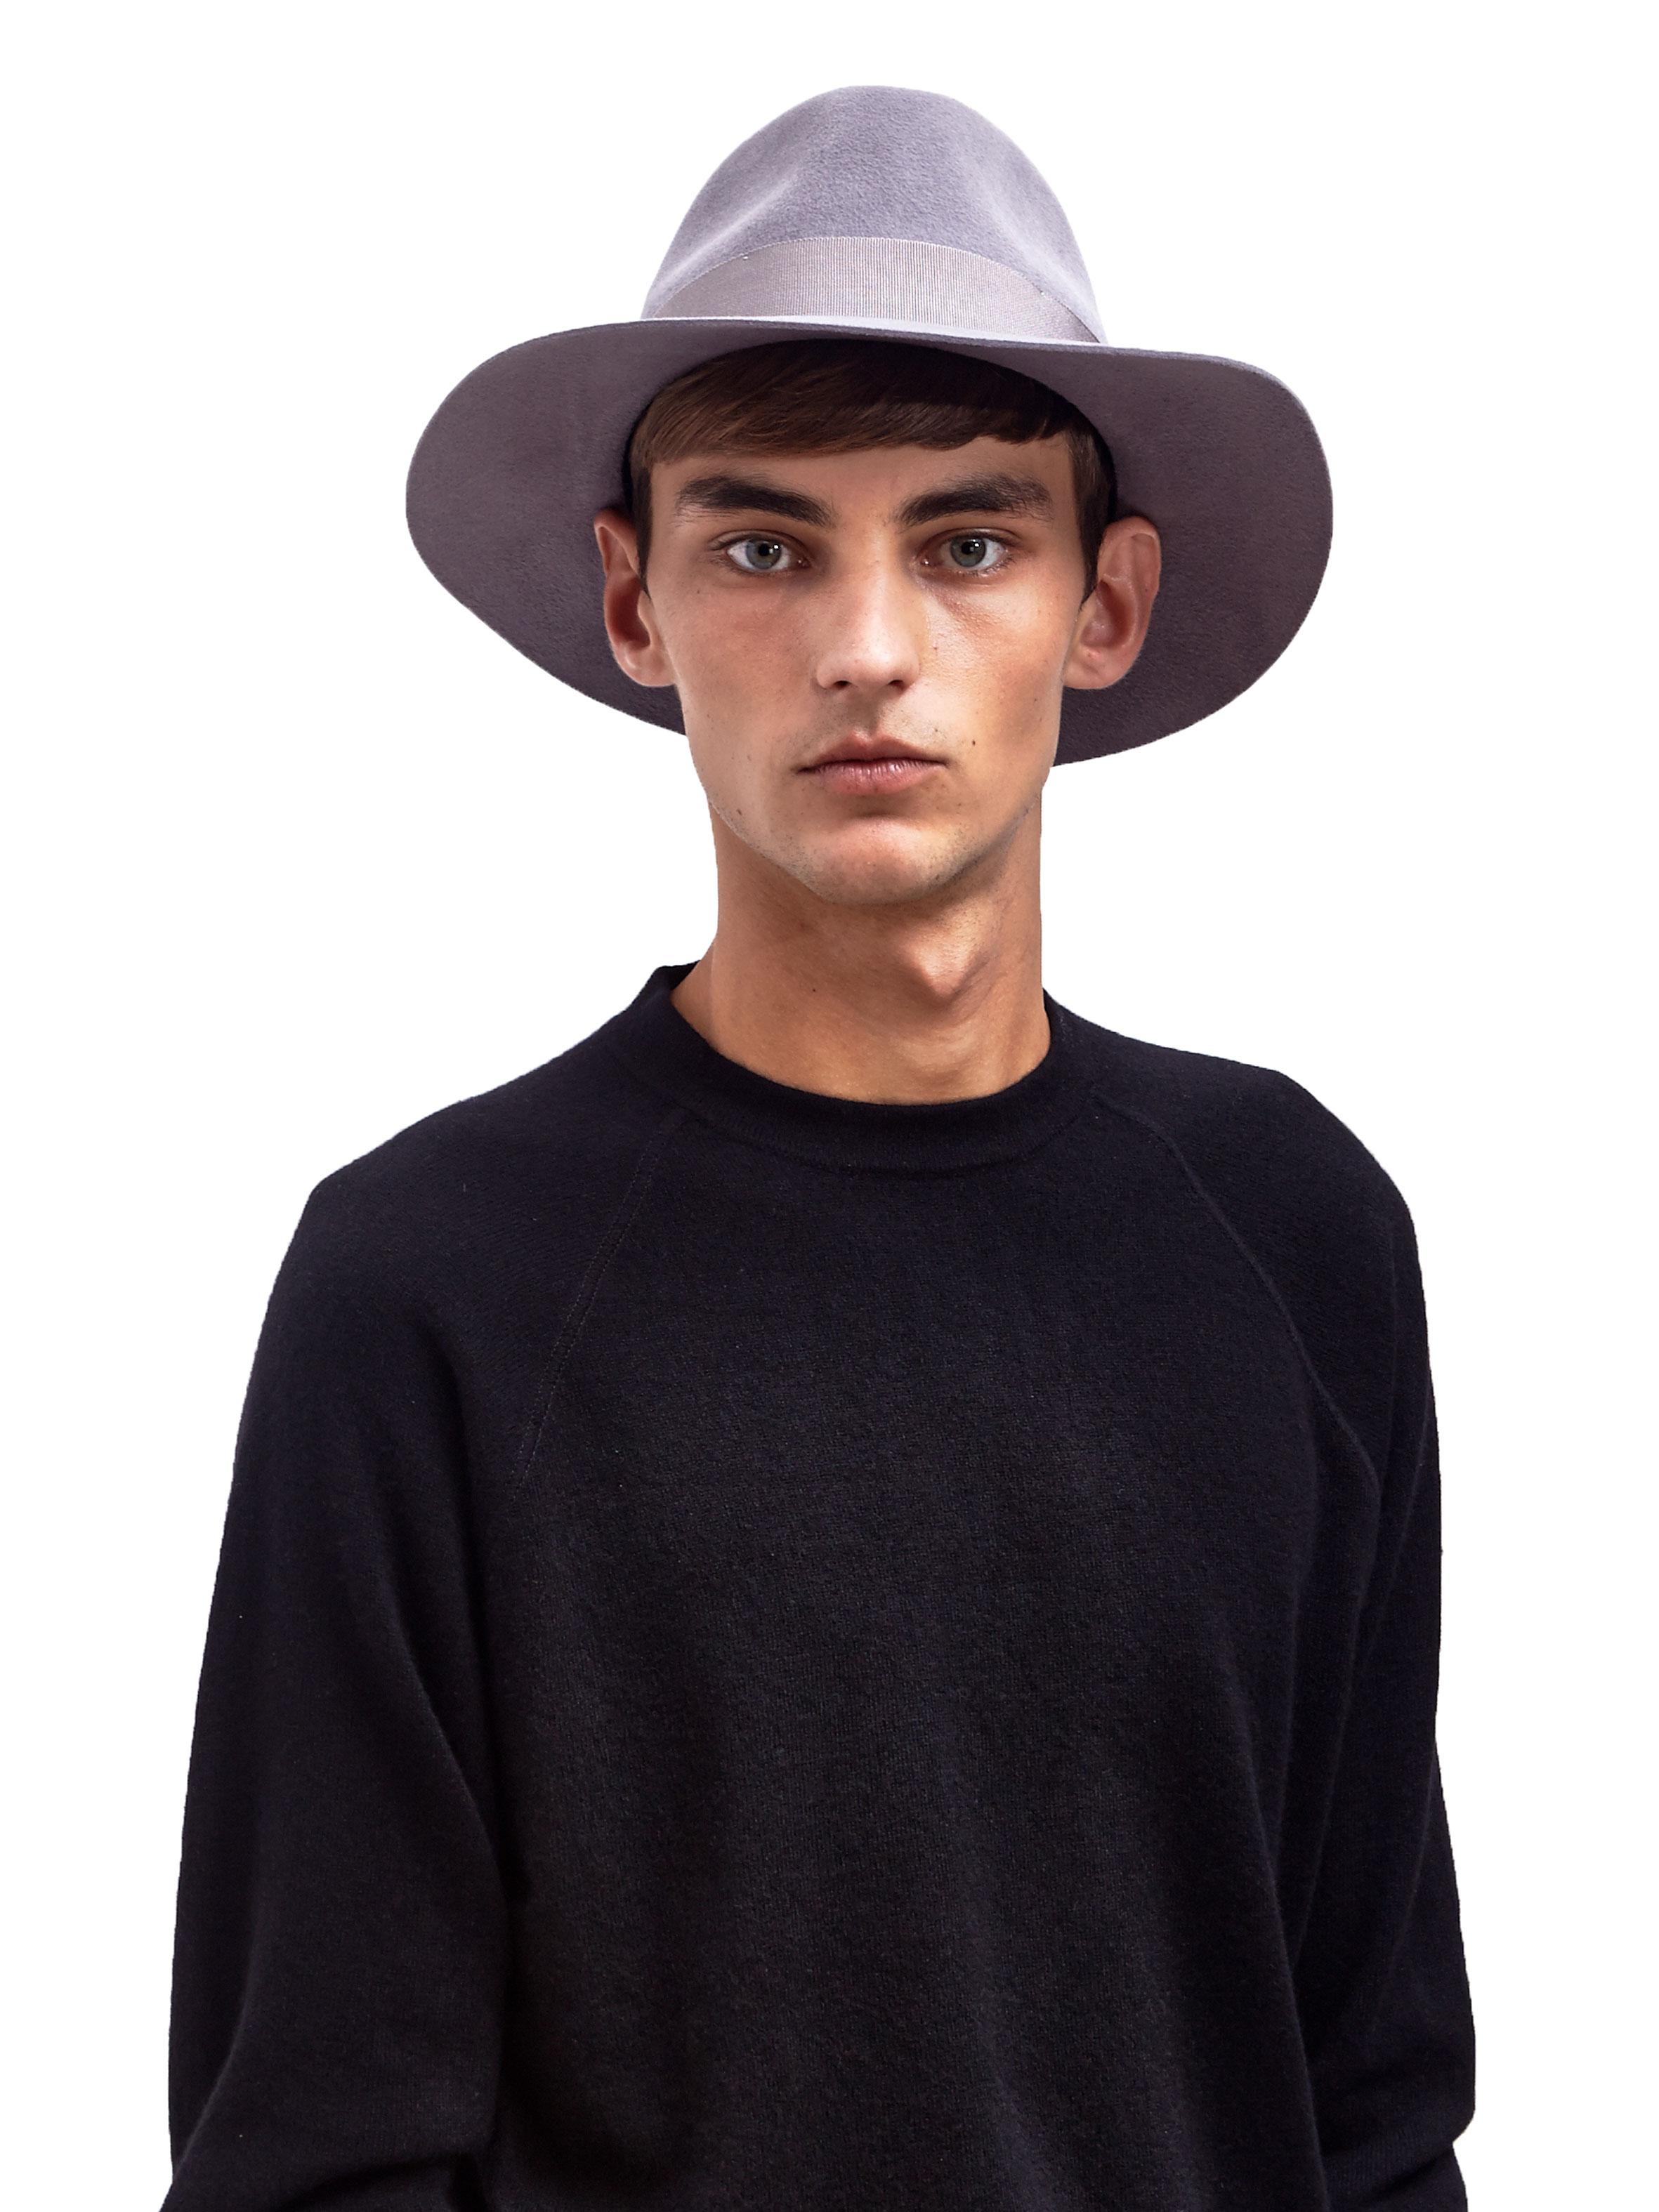 Lyst - Larose Mens Rabbit Felt Fedora Hat in Gray for Men 095f142aca8